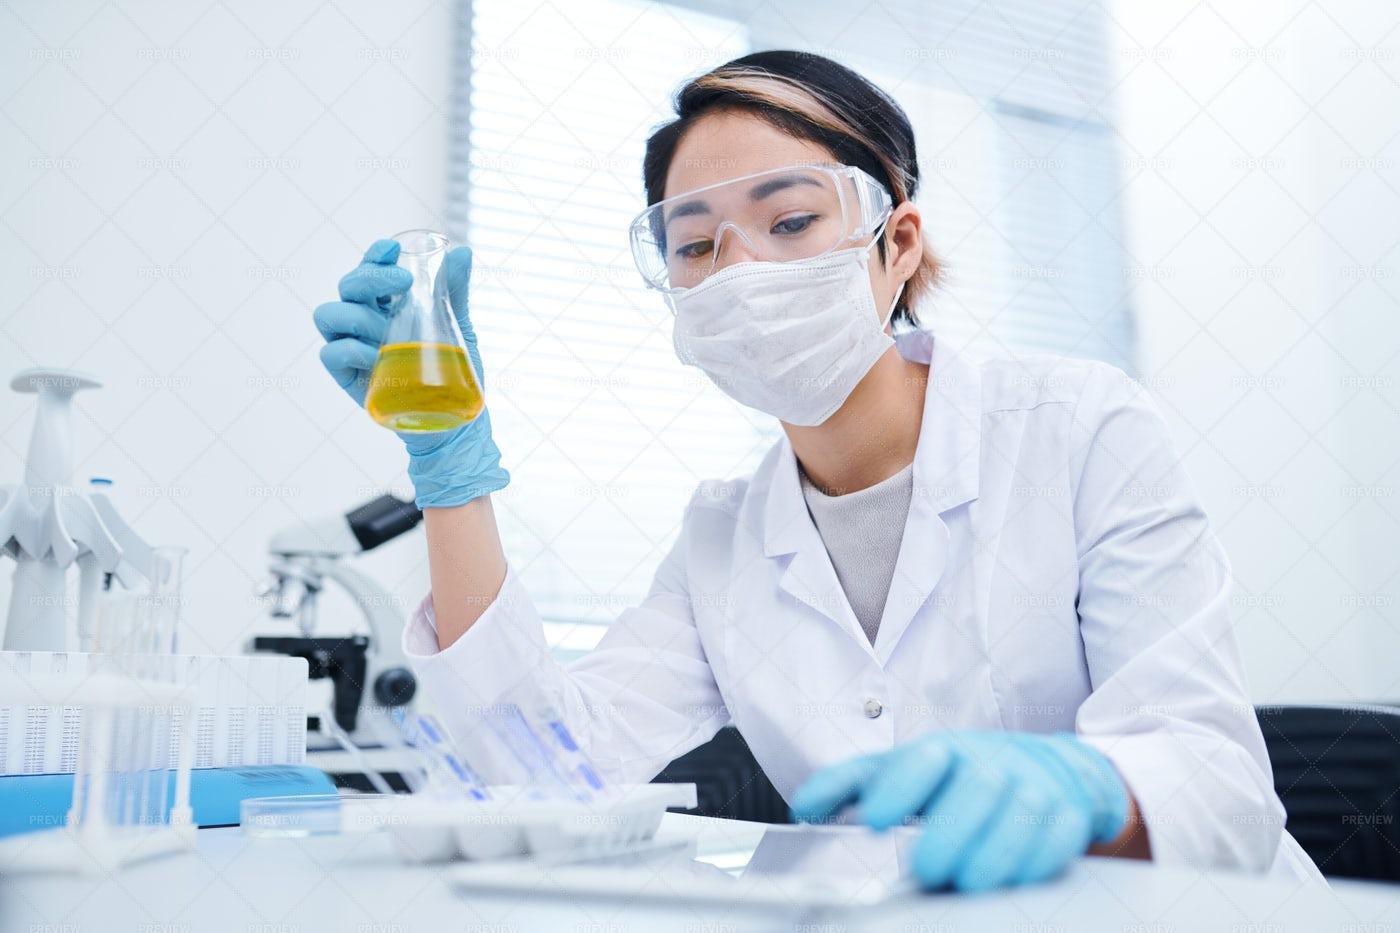 Lab Technician Processing Specimen: Stock Photos